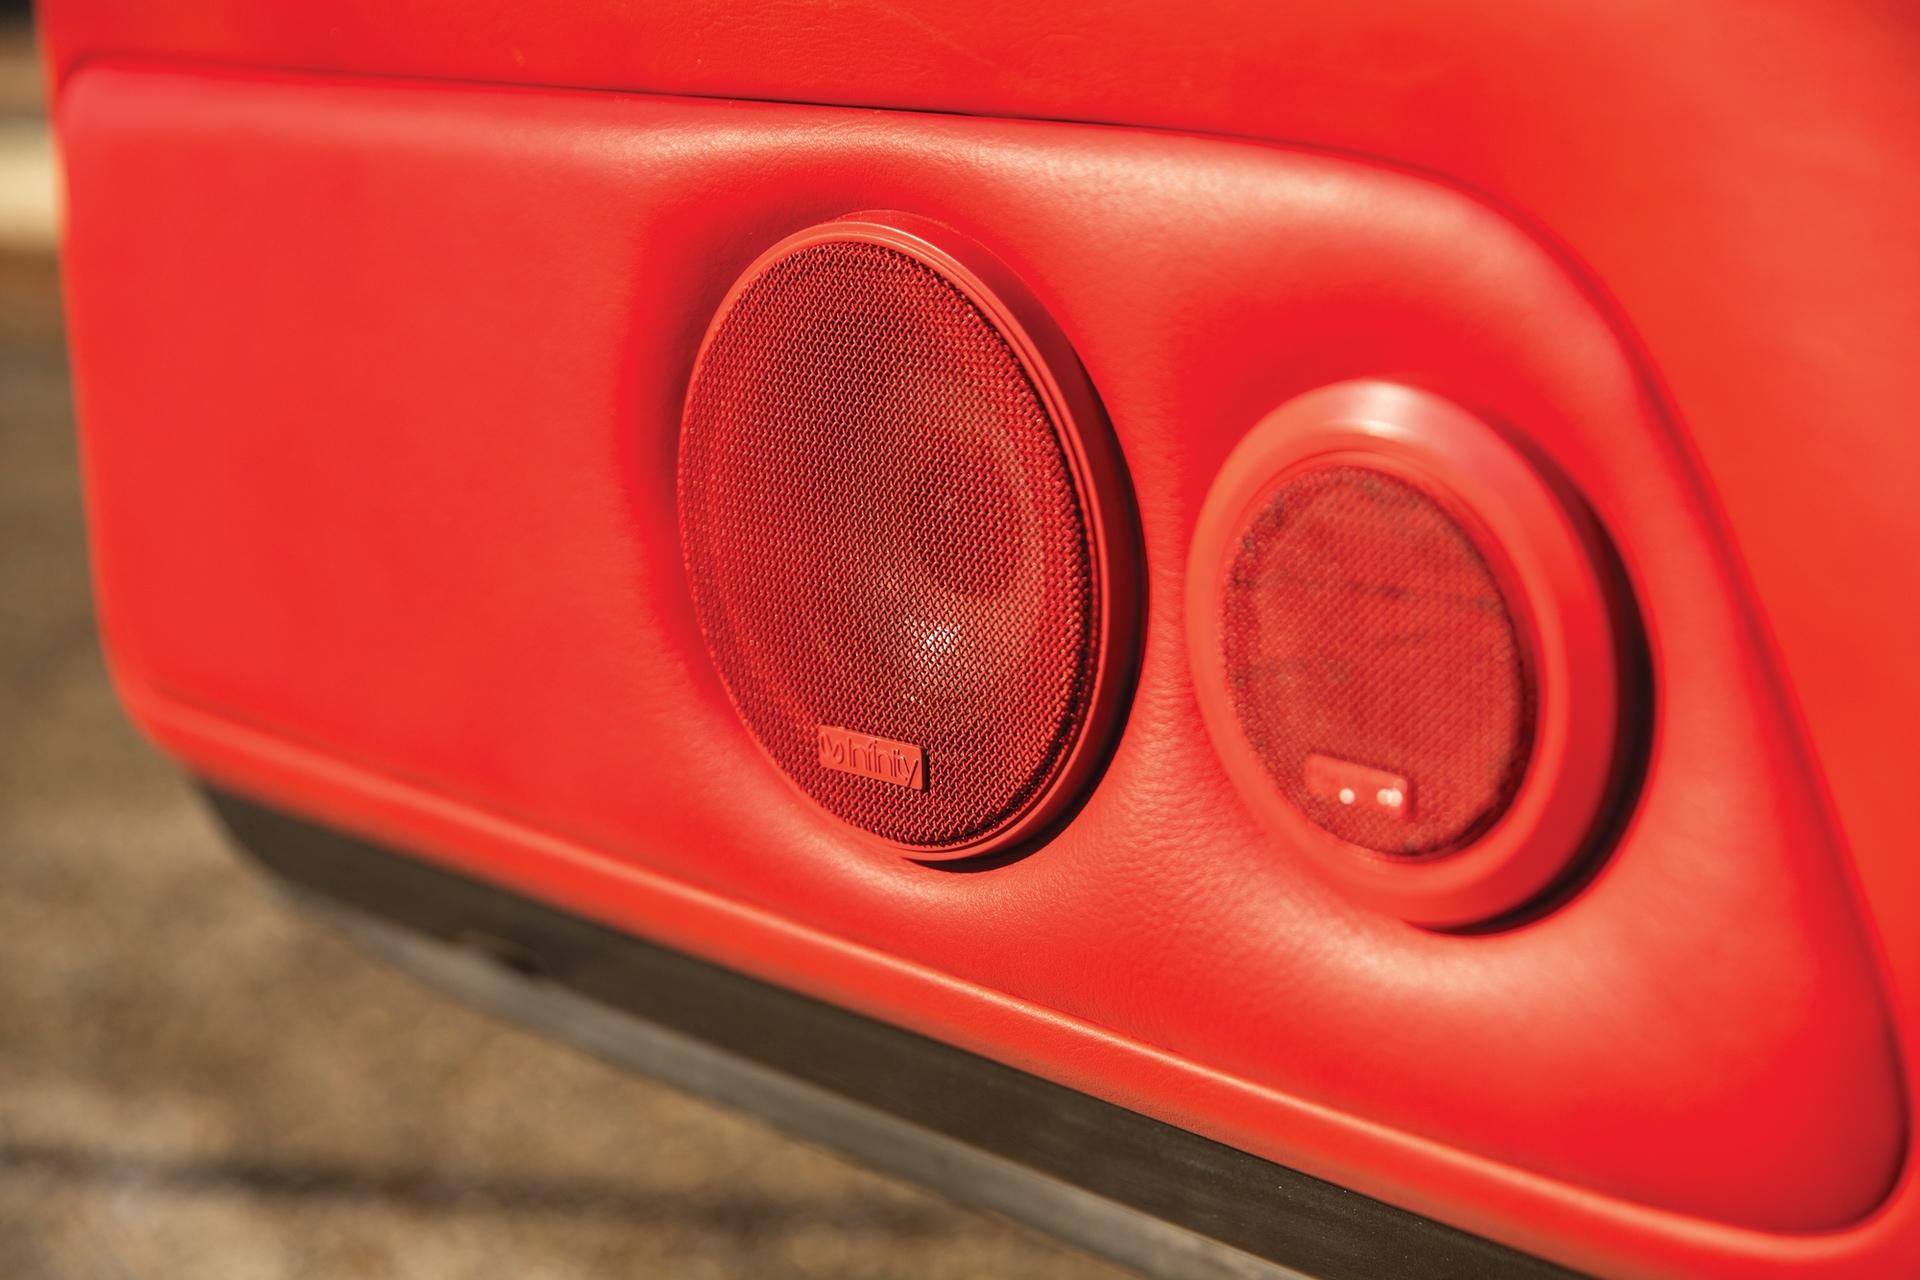 1987-BMW-Alpina-B7-Turbo-Coupe_3_18